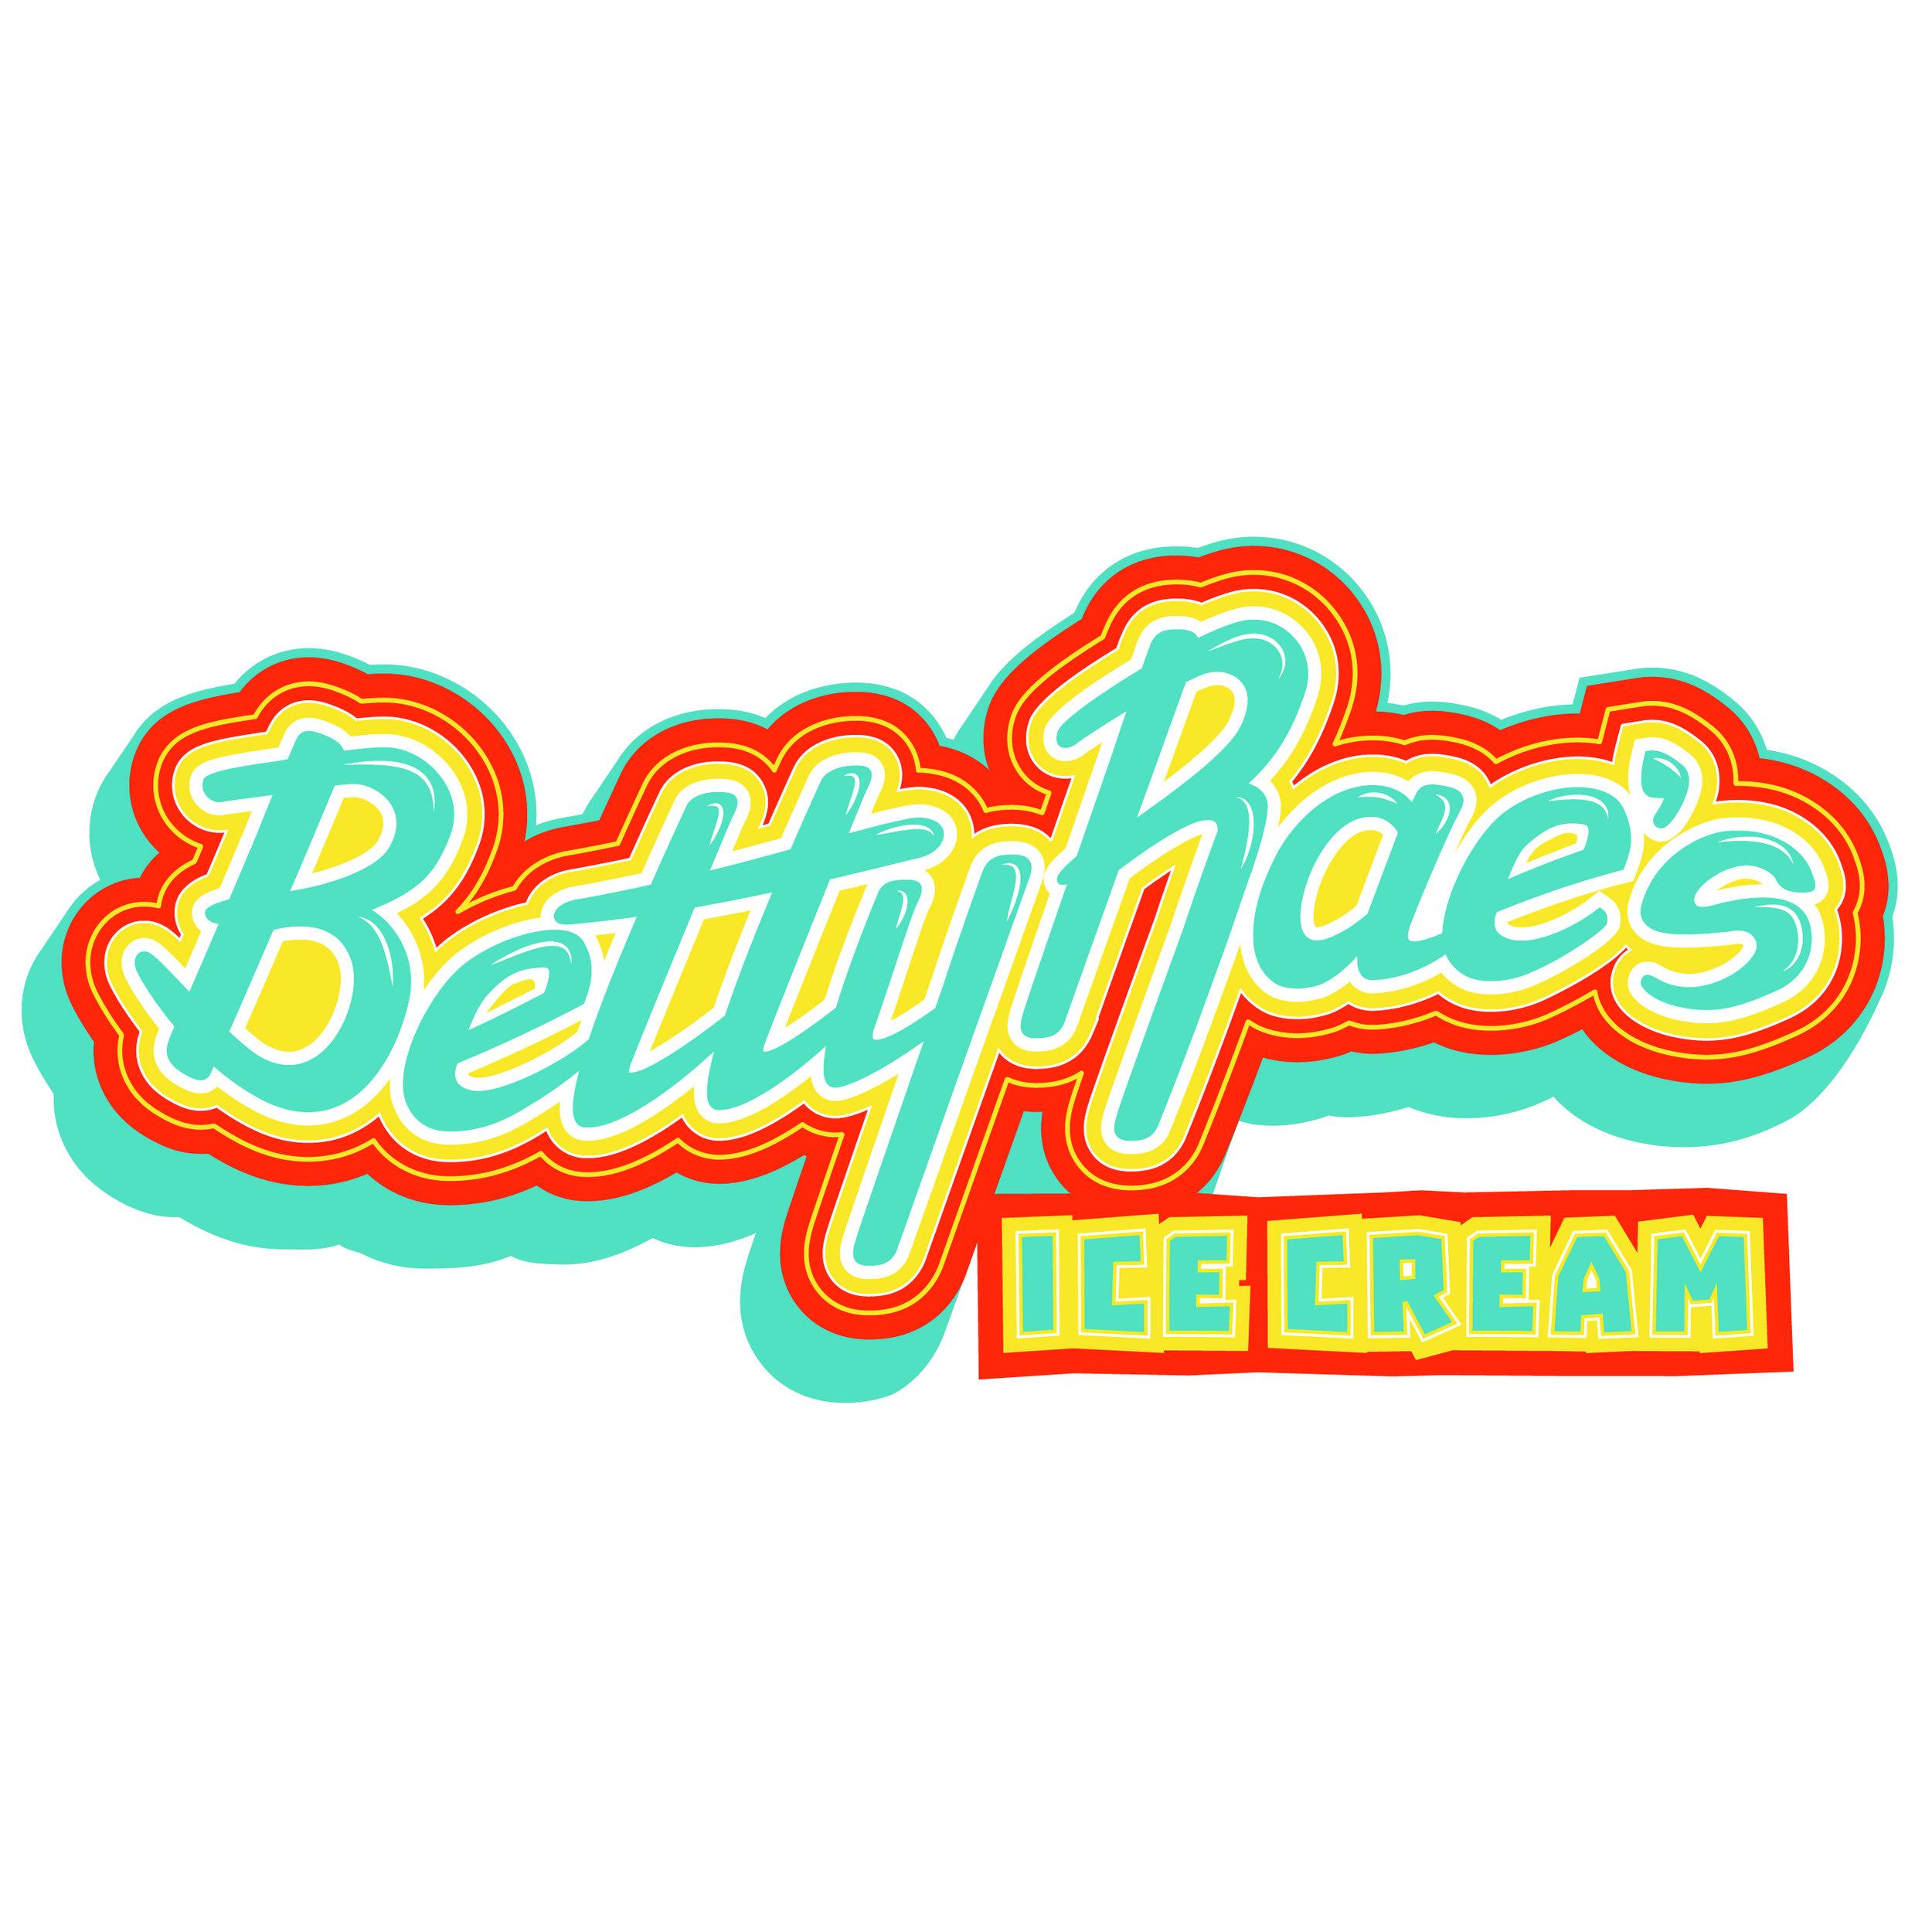 2019.08.05 Betty Raes Ice Cream.jpg